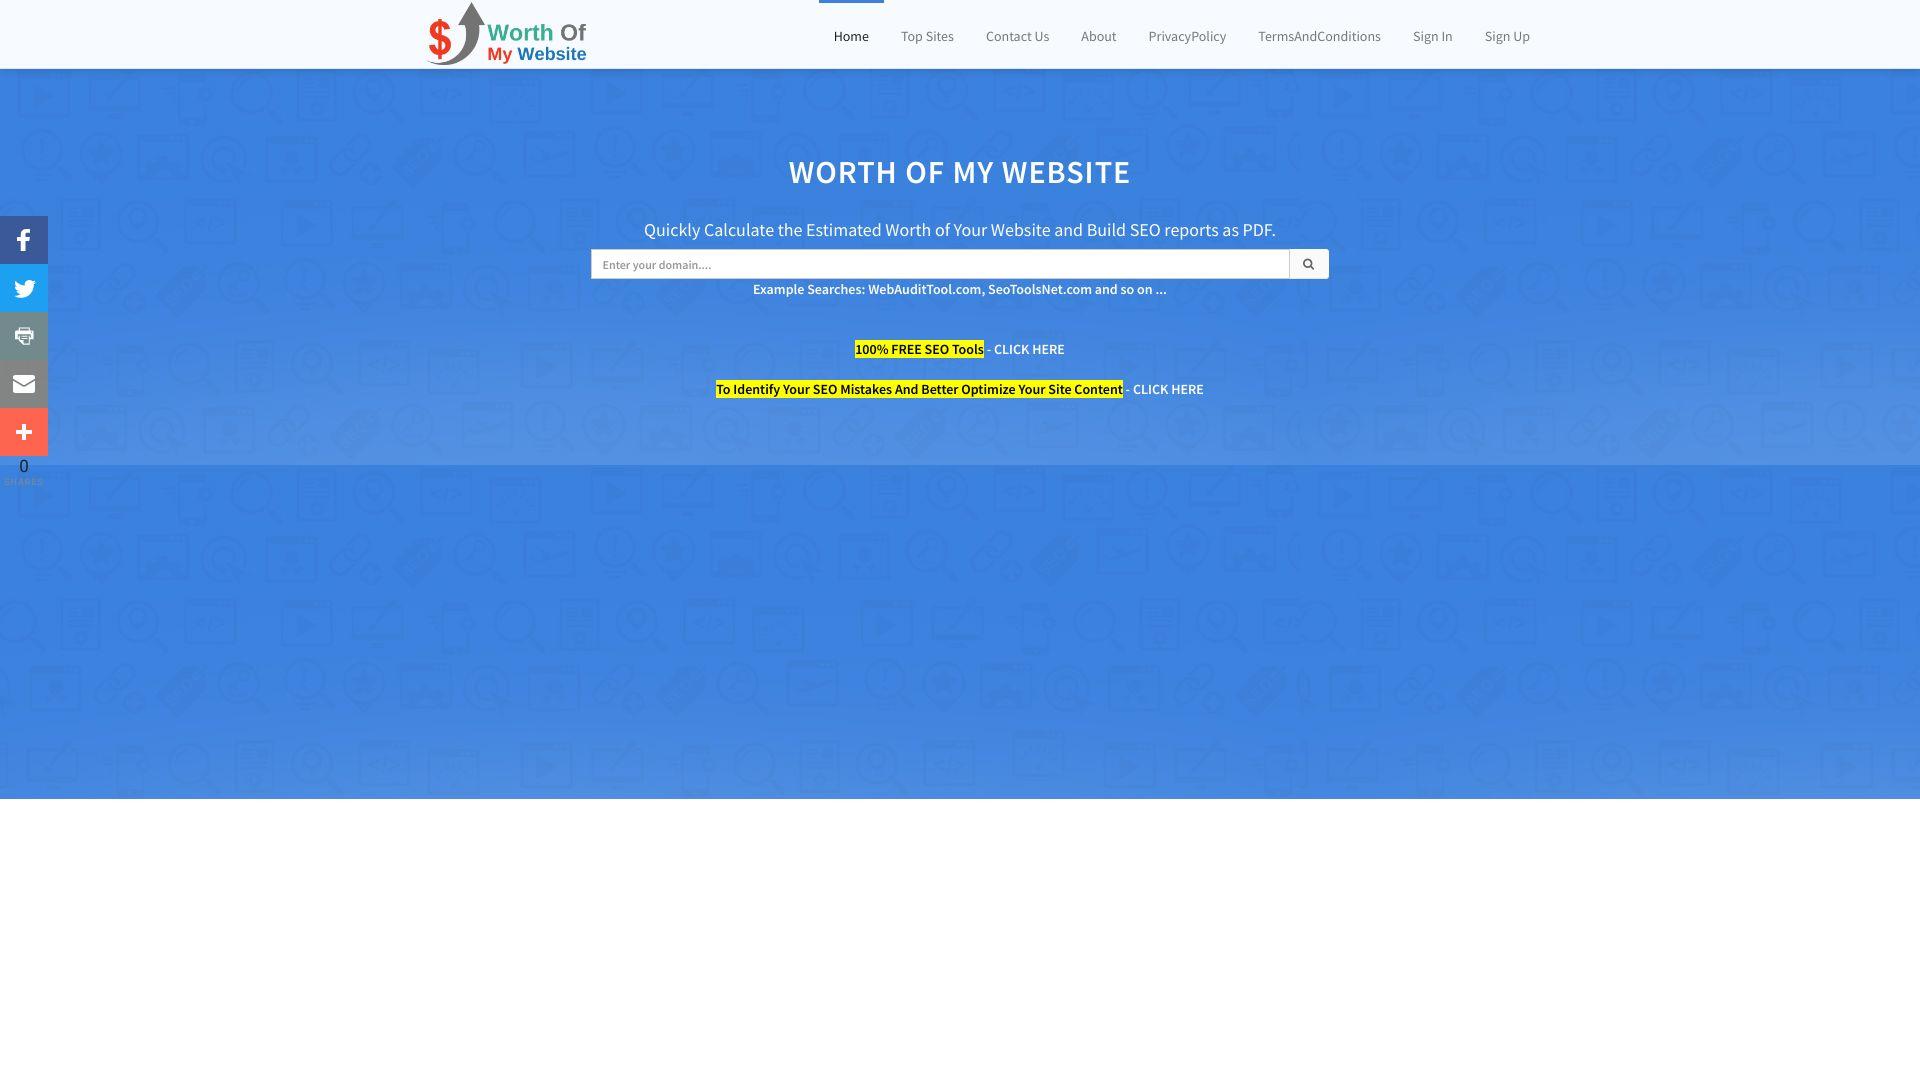 worthofmywebsite.com